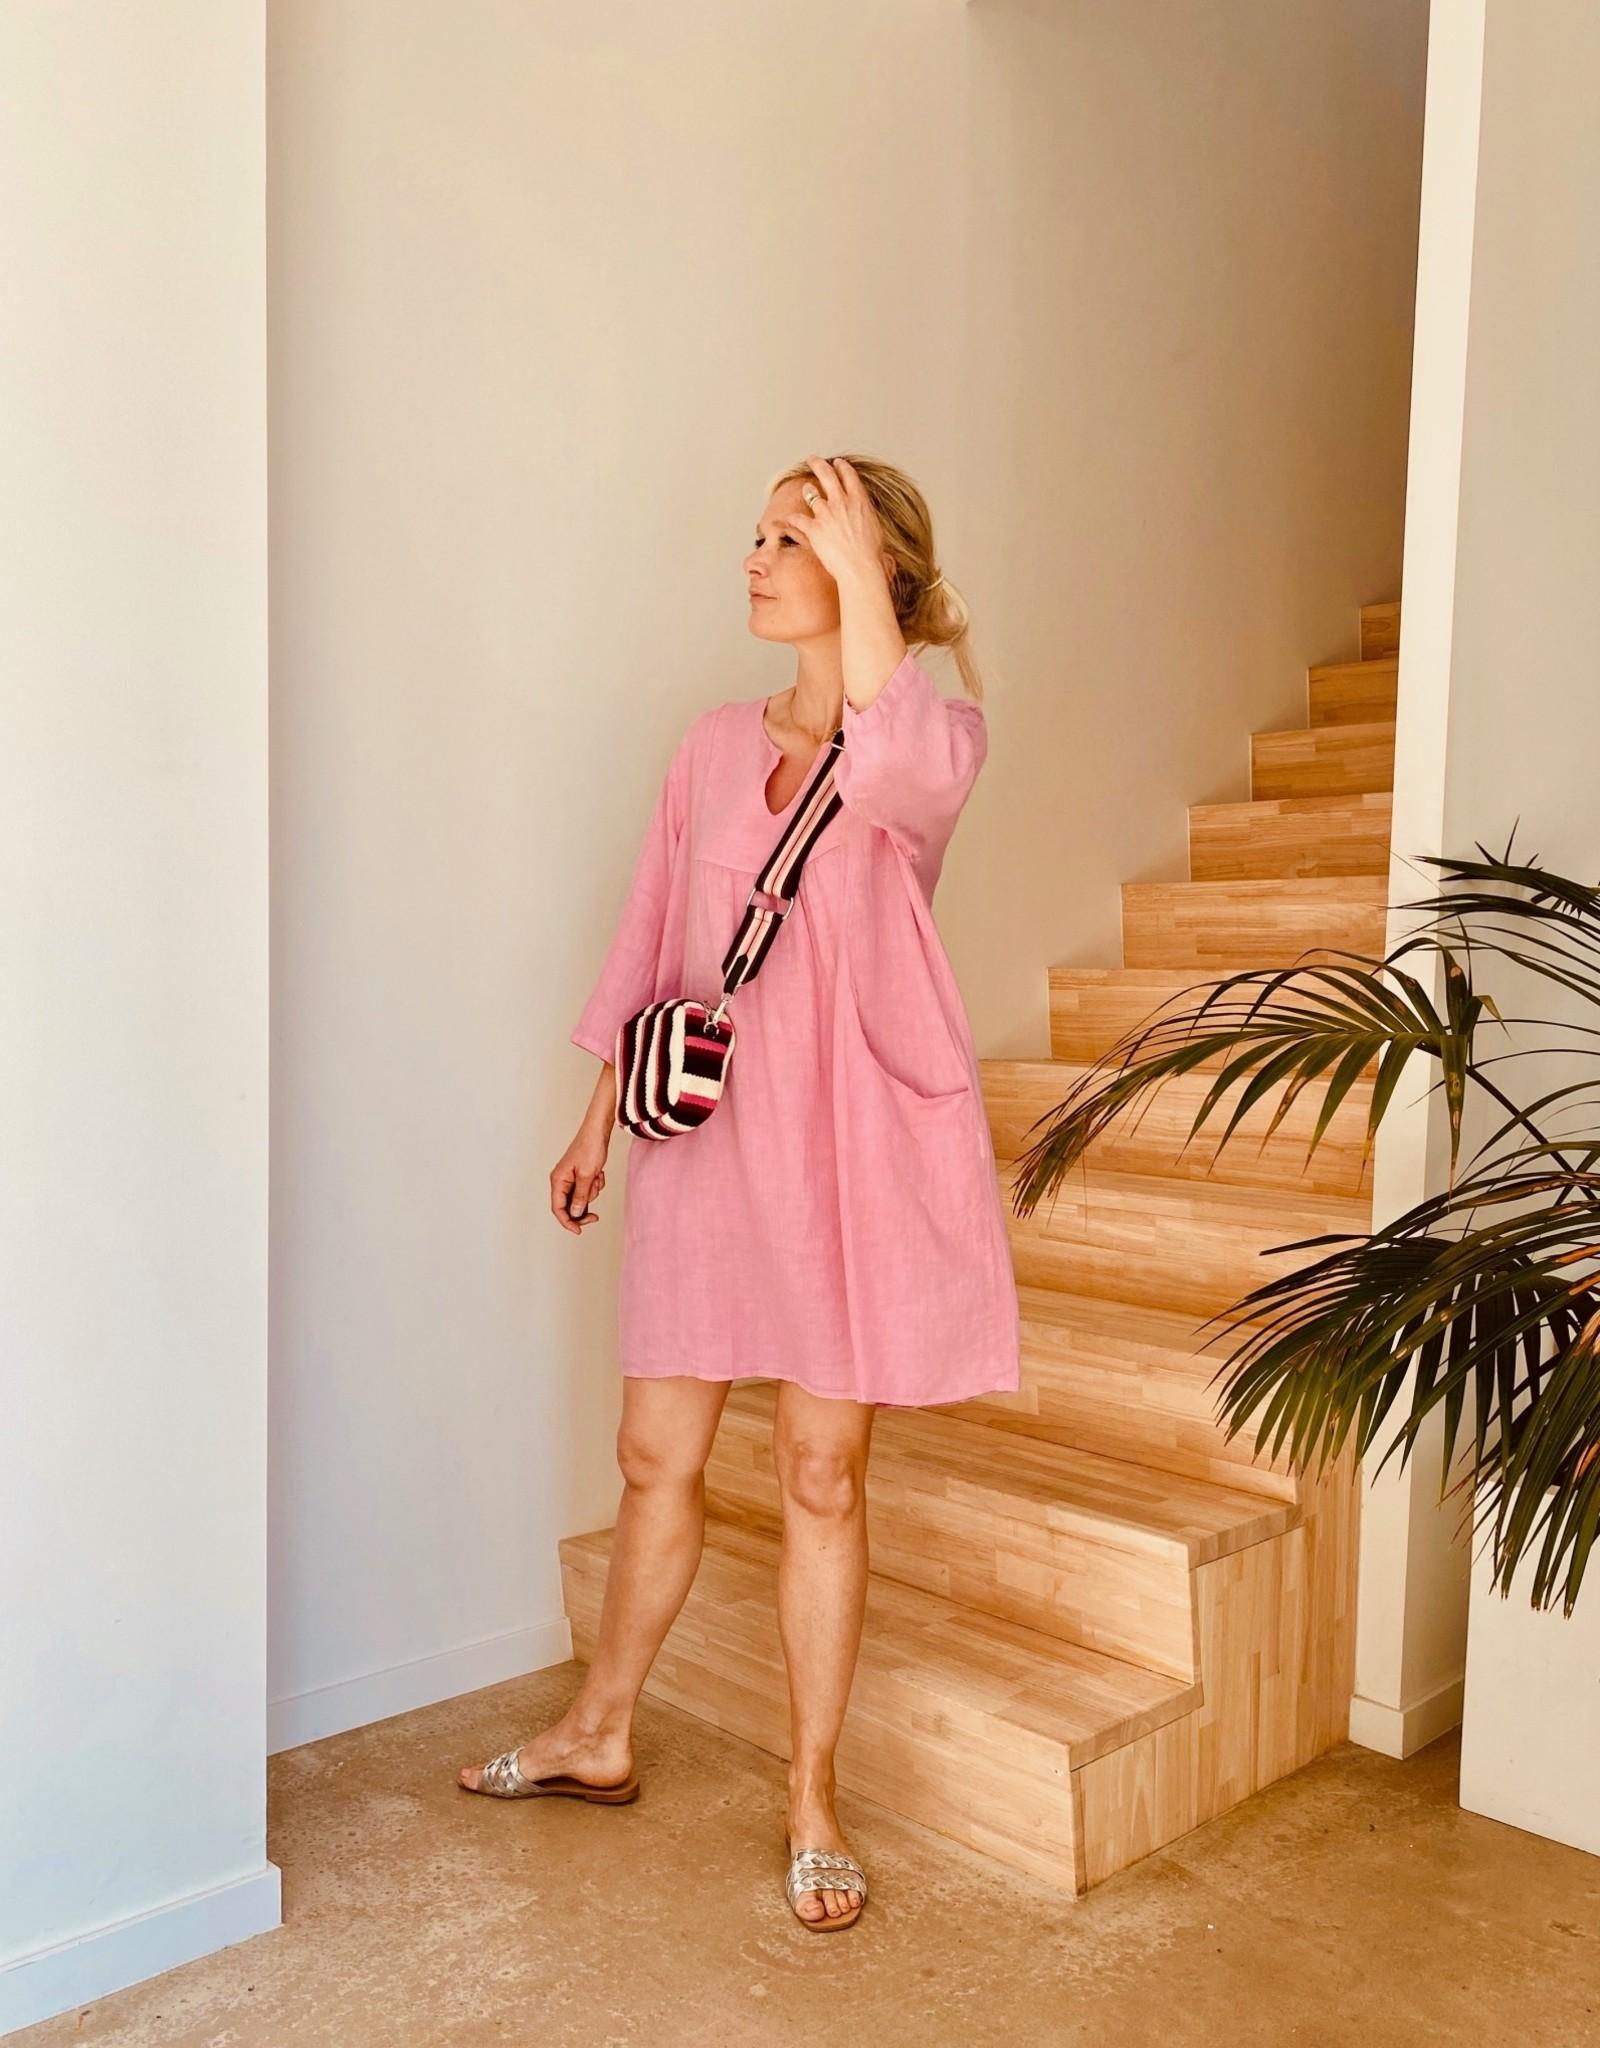 The Golden House Jurk 'Jane' - V198 - Taille Unique - Roze